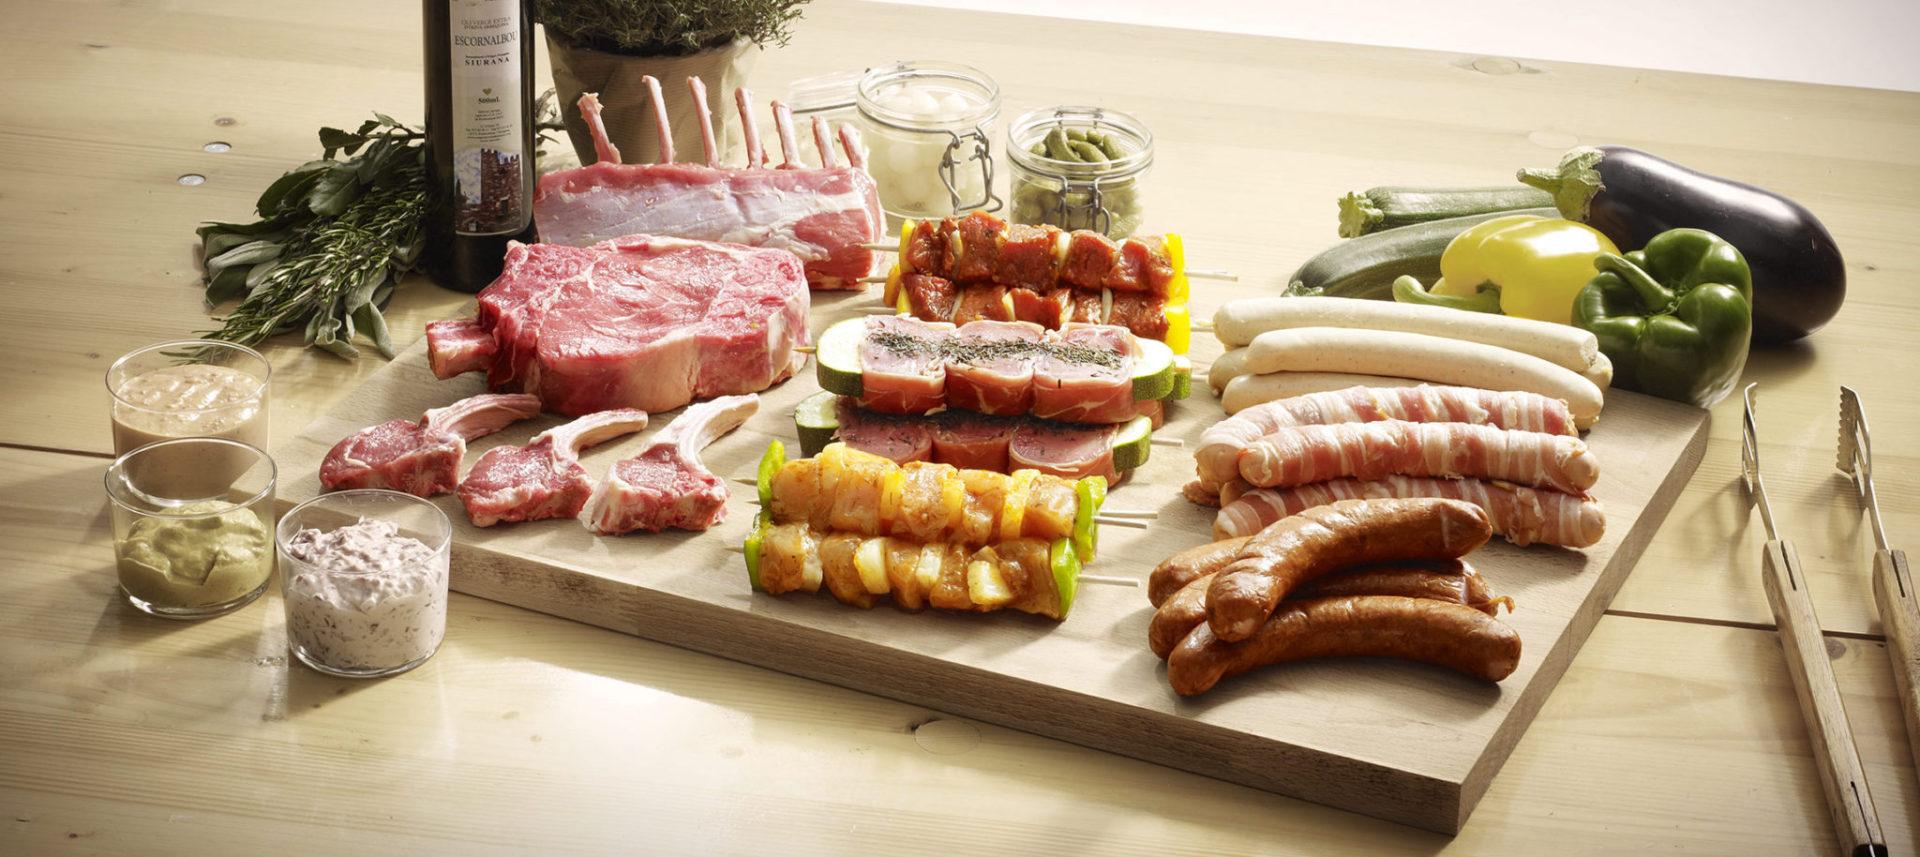 barbecue, brochettes, plancha, Maison Steffen astuces barbecue maison steffen boucherie boucher luxembourg